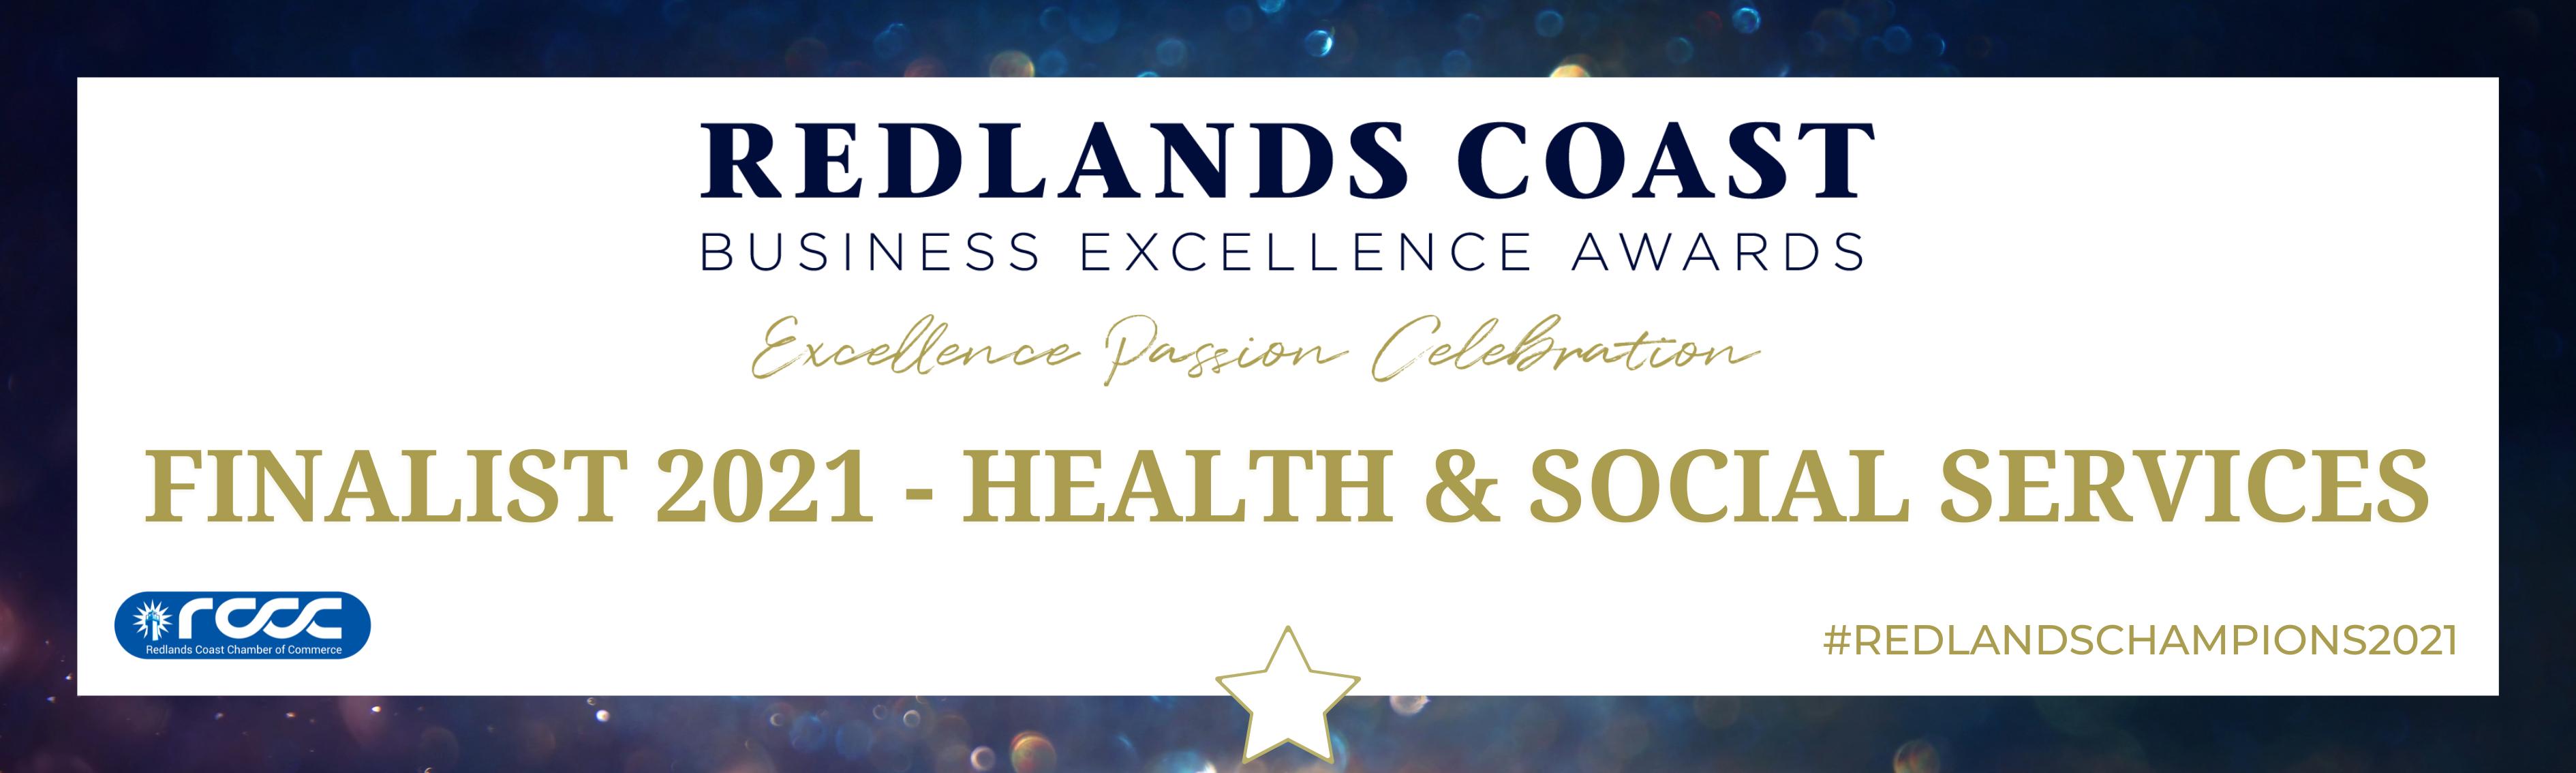 Redlands Chamber of Commerce finalist 2021